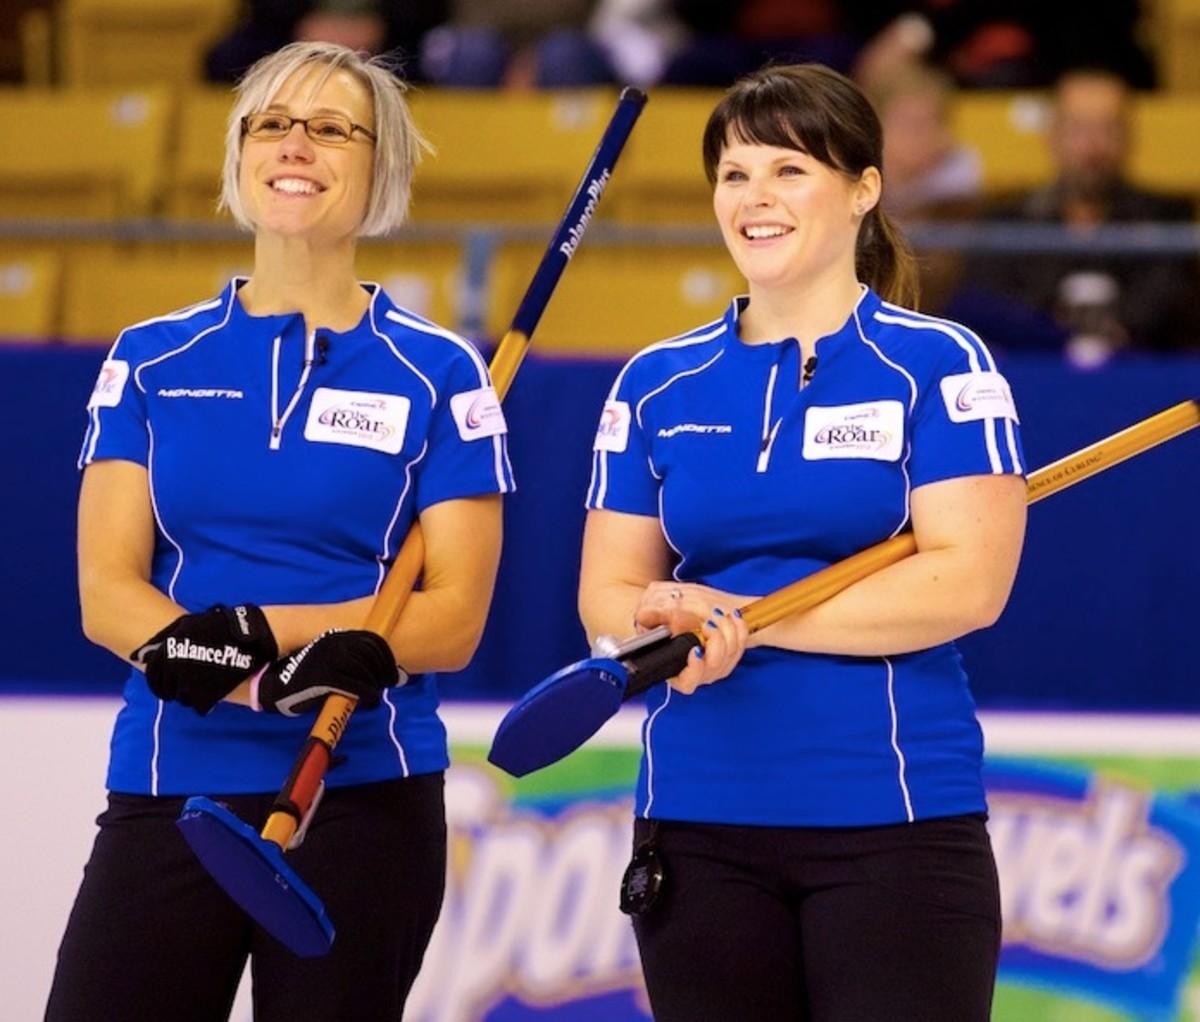 Team Sonnenberg enjoyed Kitchener